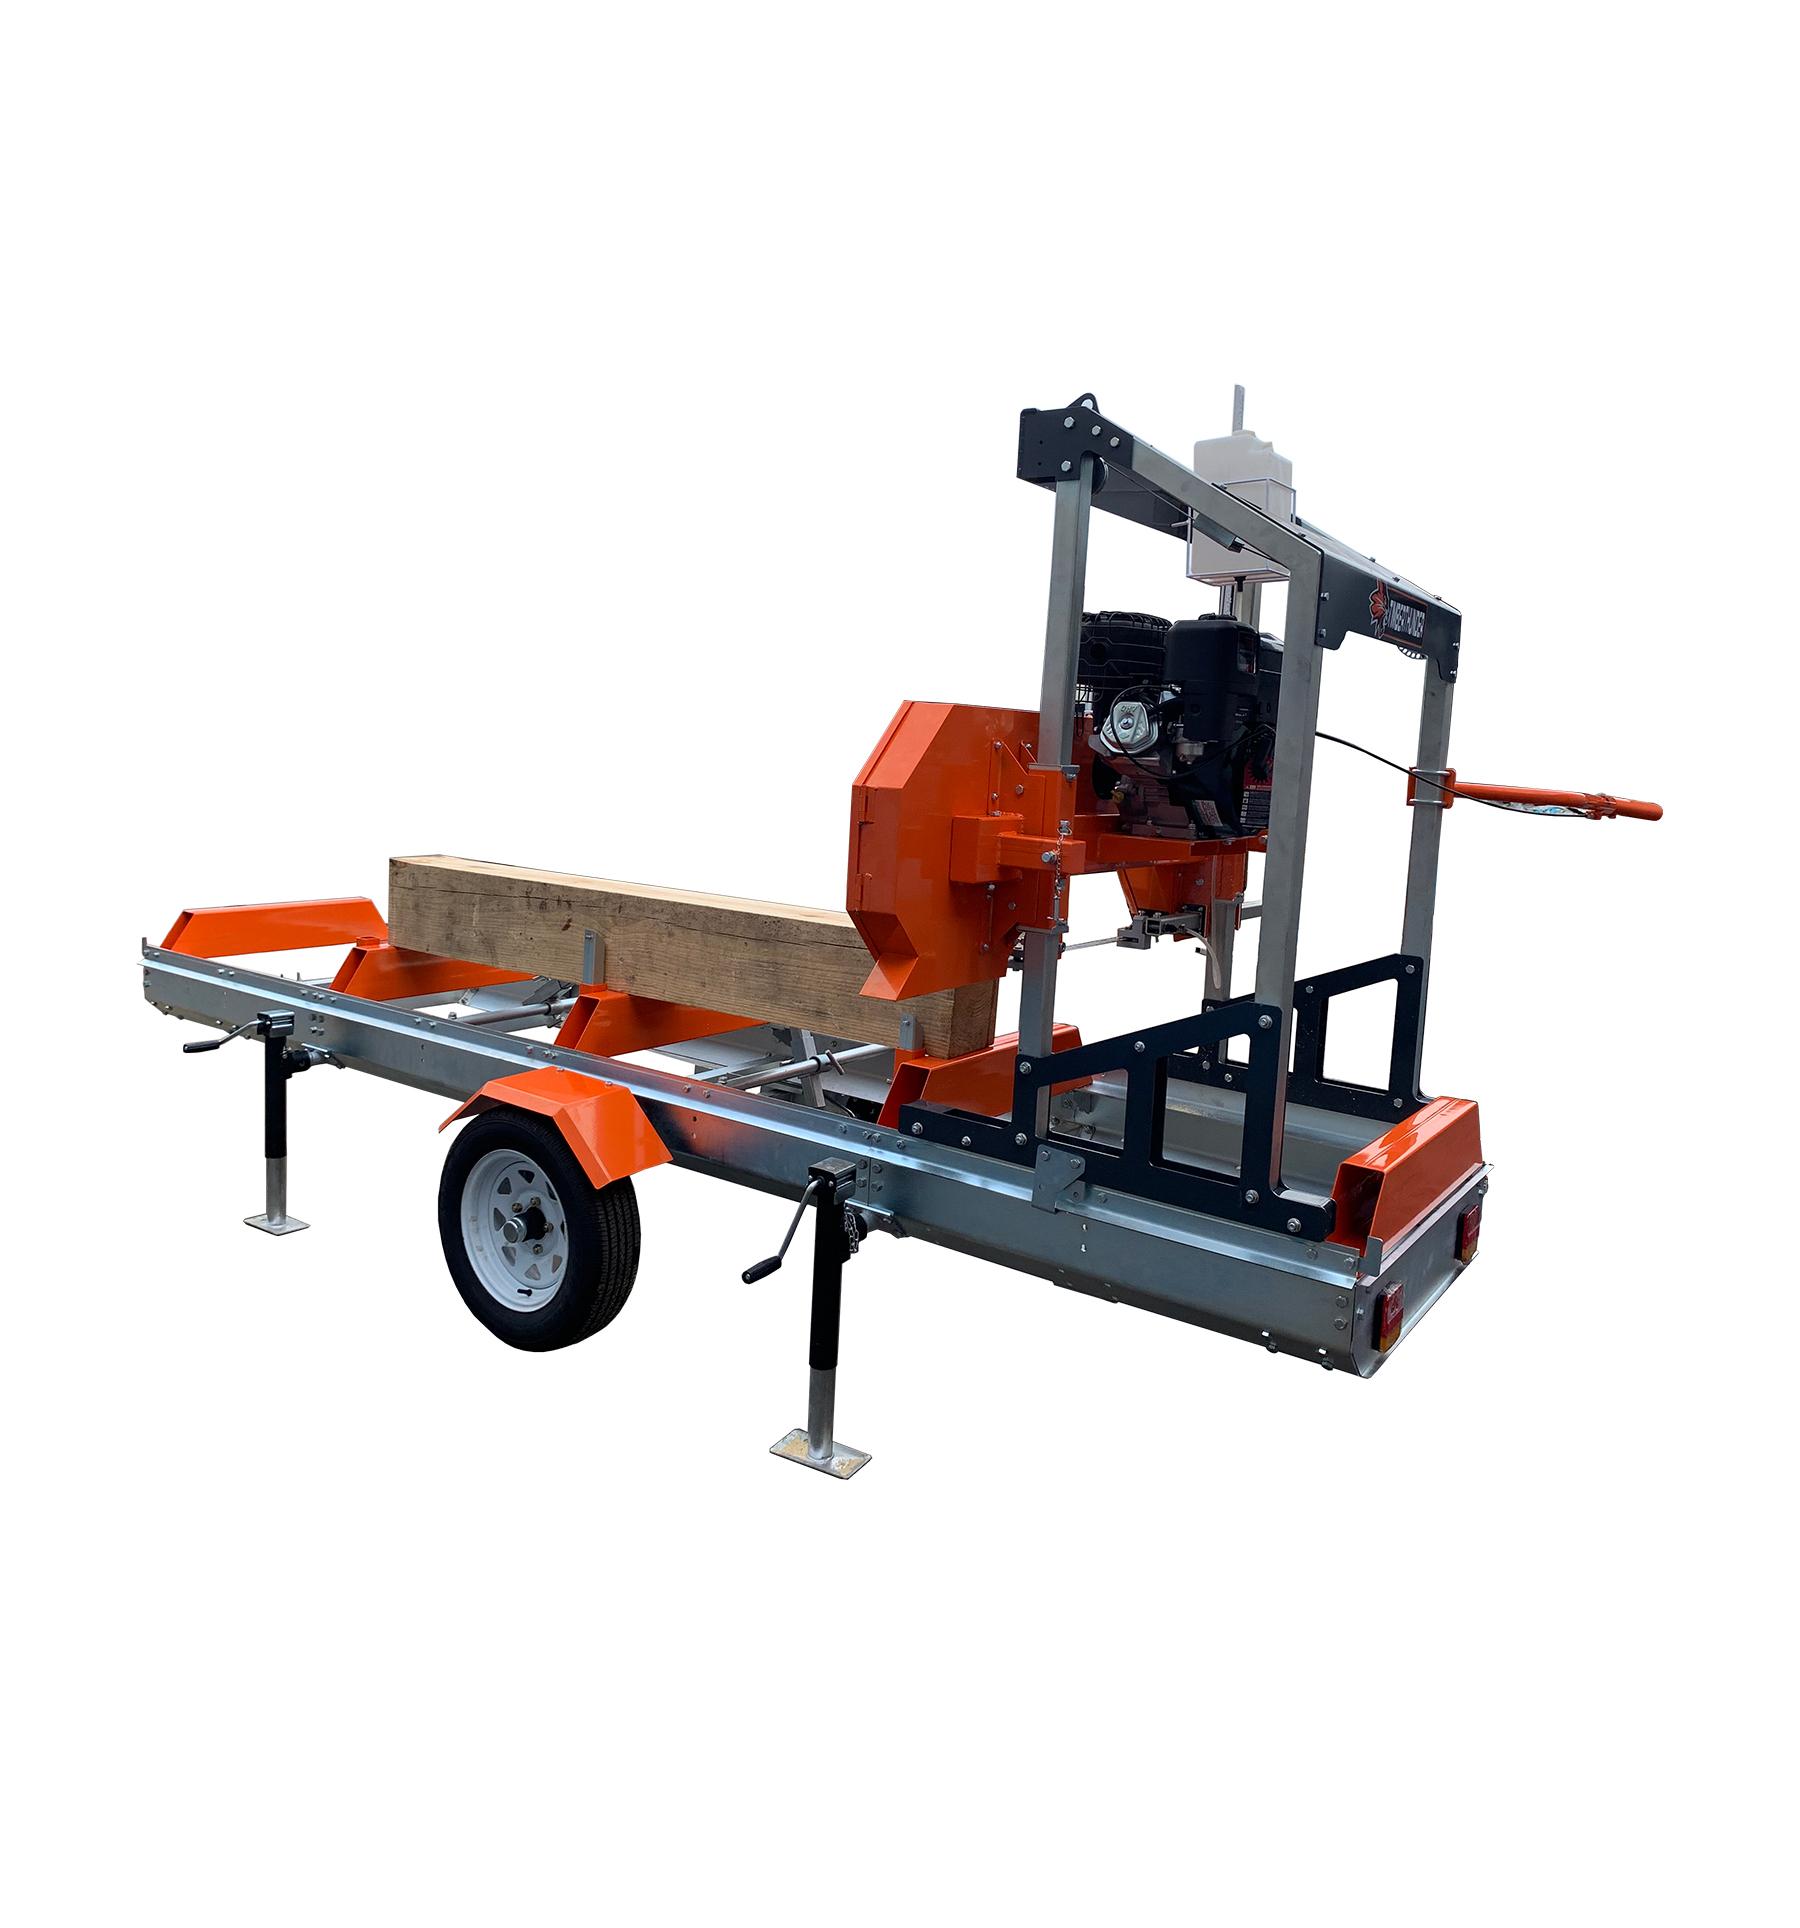 Horizontal diesel log portable band sawmill for log